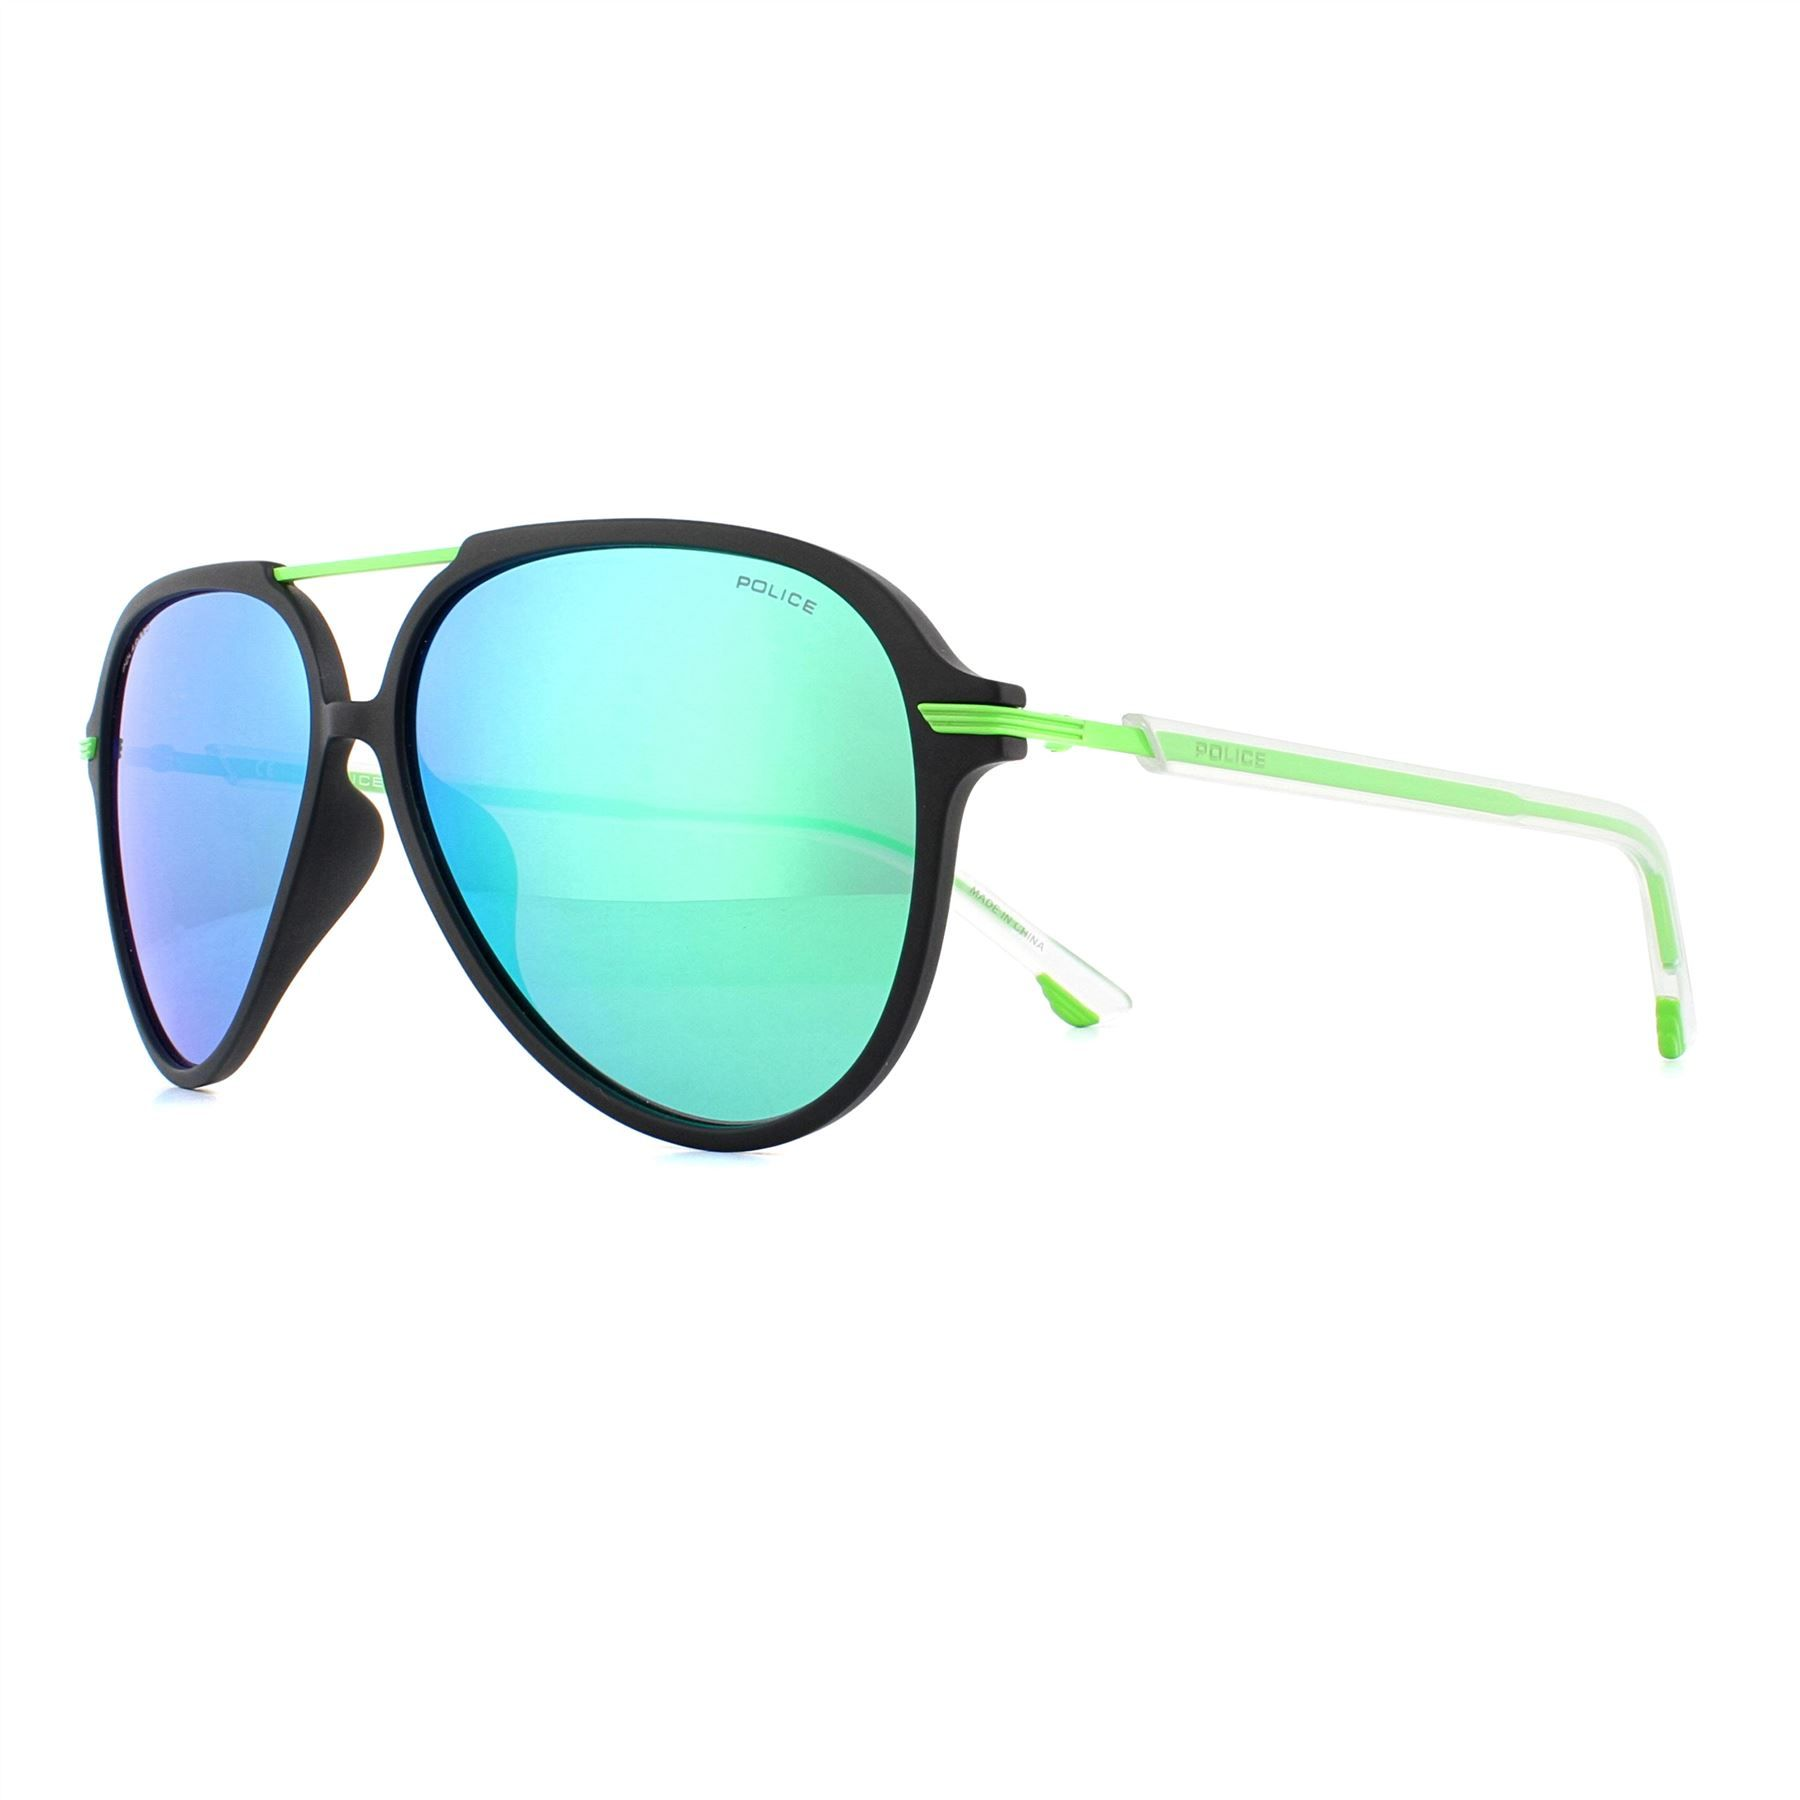 Police Sunglasses SPL582 Drop 2 U28V Matte Black Green Mirror Polarized